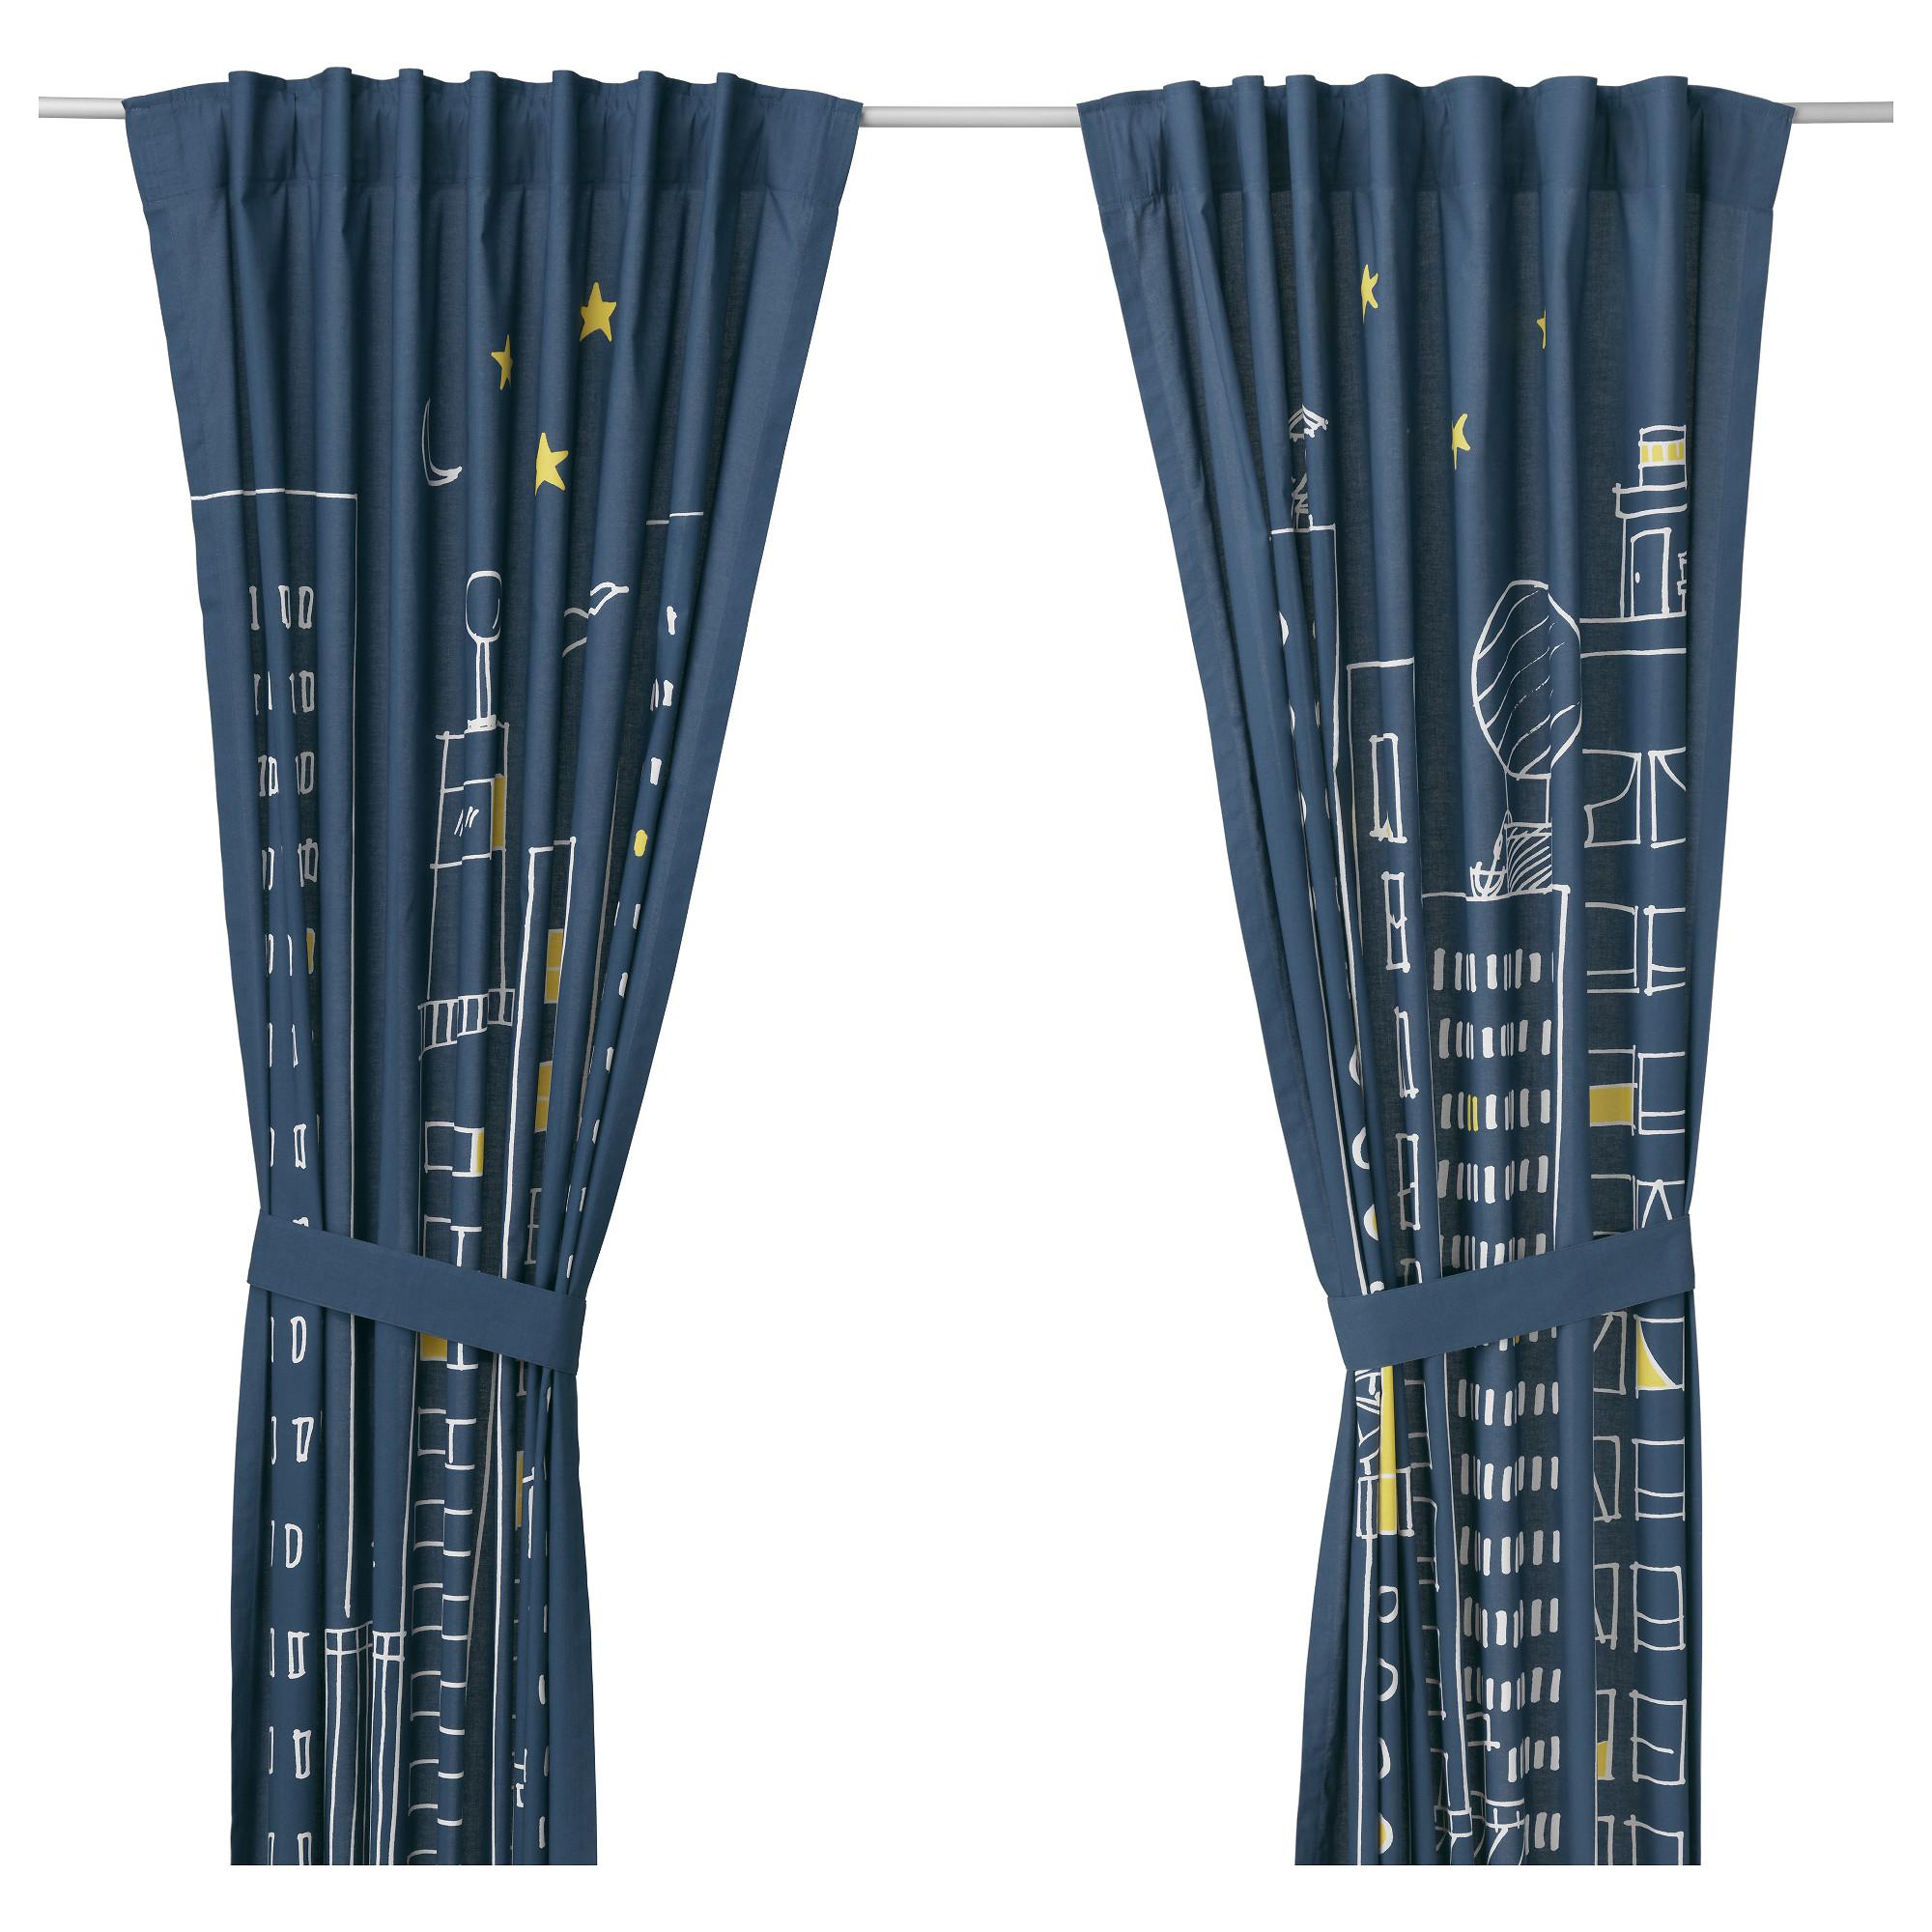 childrens curtains hemmahos curtains with tie-backs, 1 pair, dark blue length: 98  DECMSAX